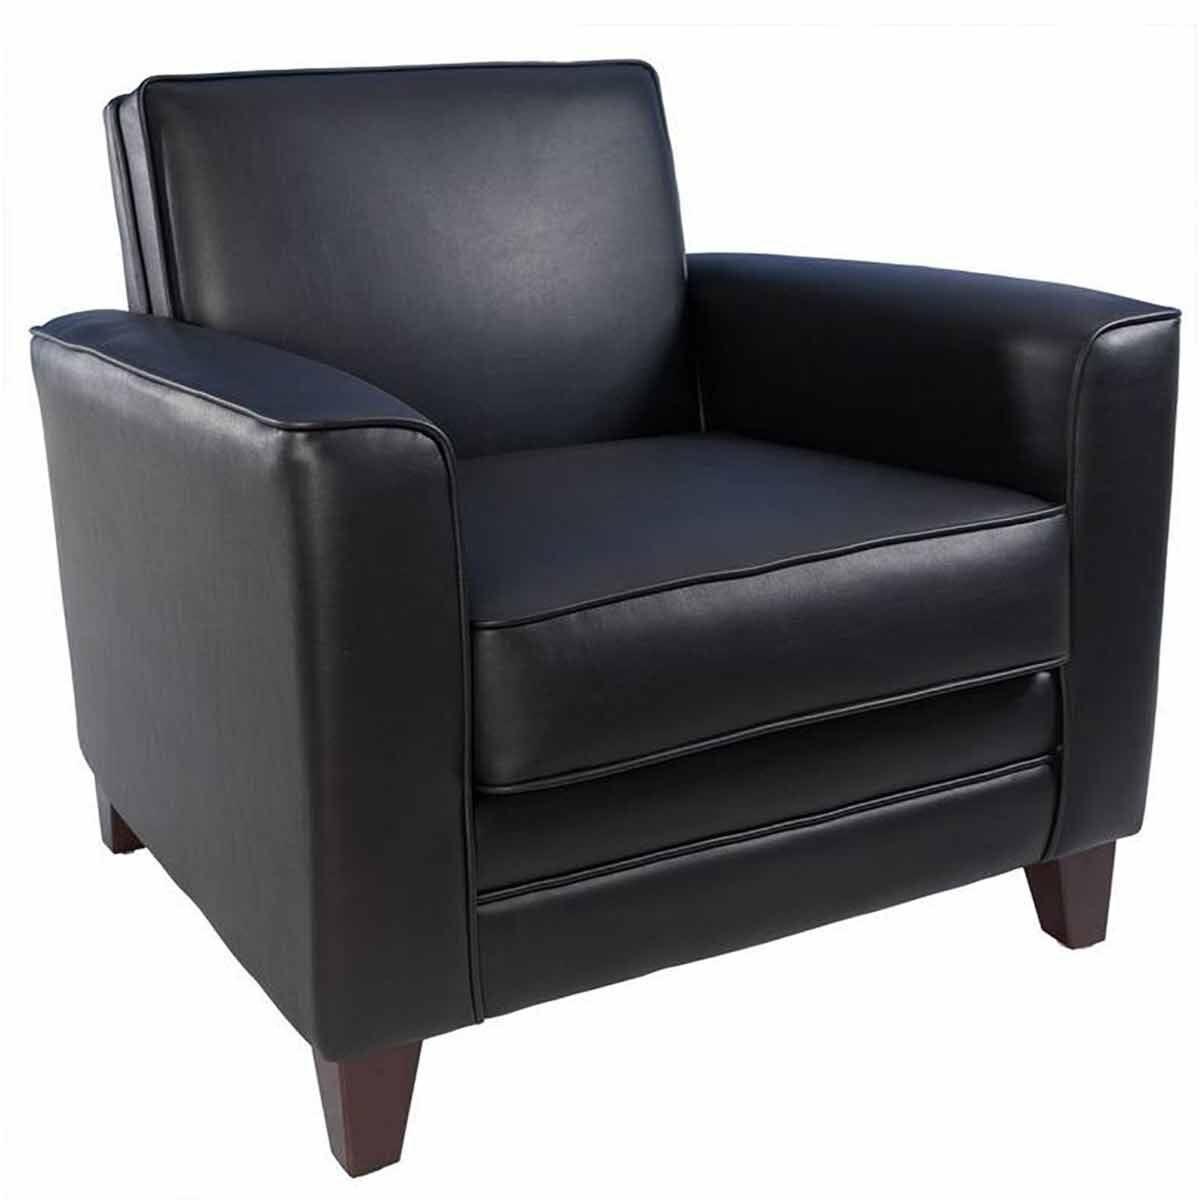 Teknik Office Newport Leather Faced Reception Armchair